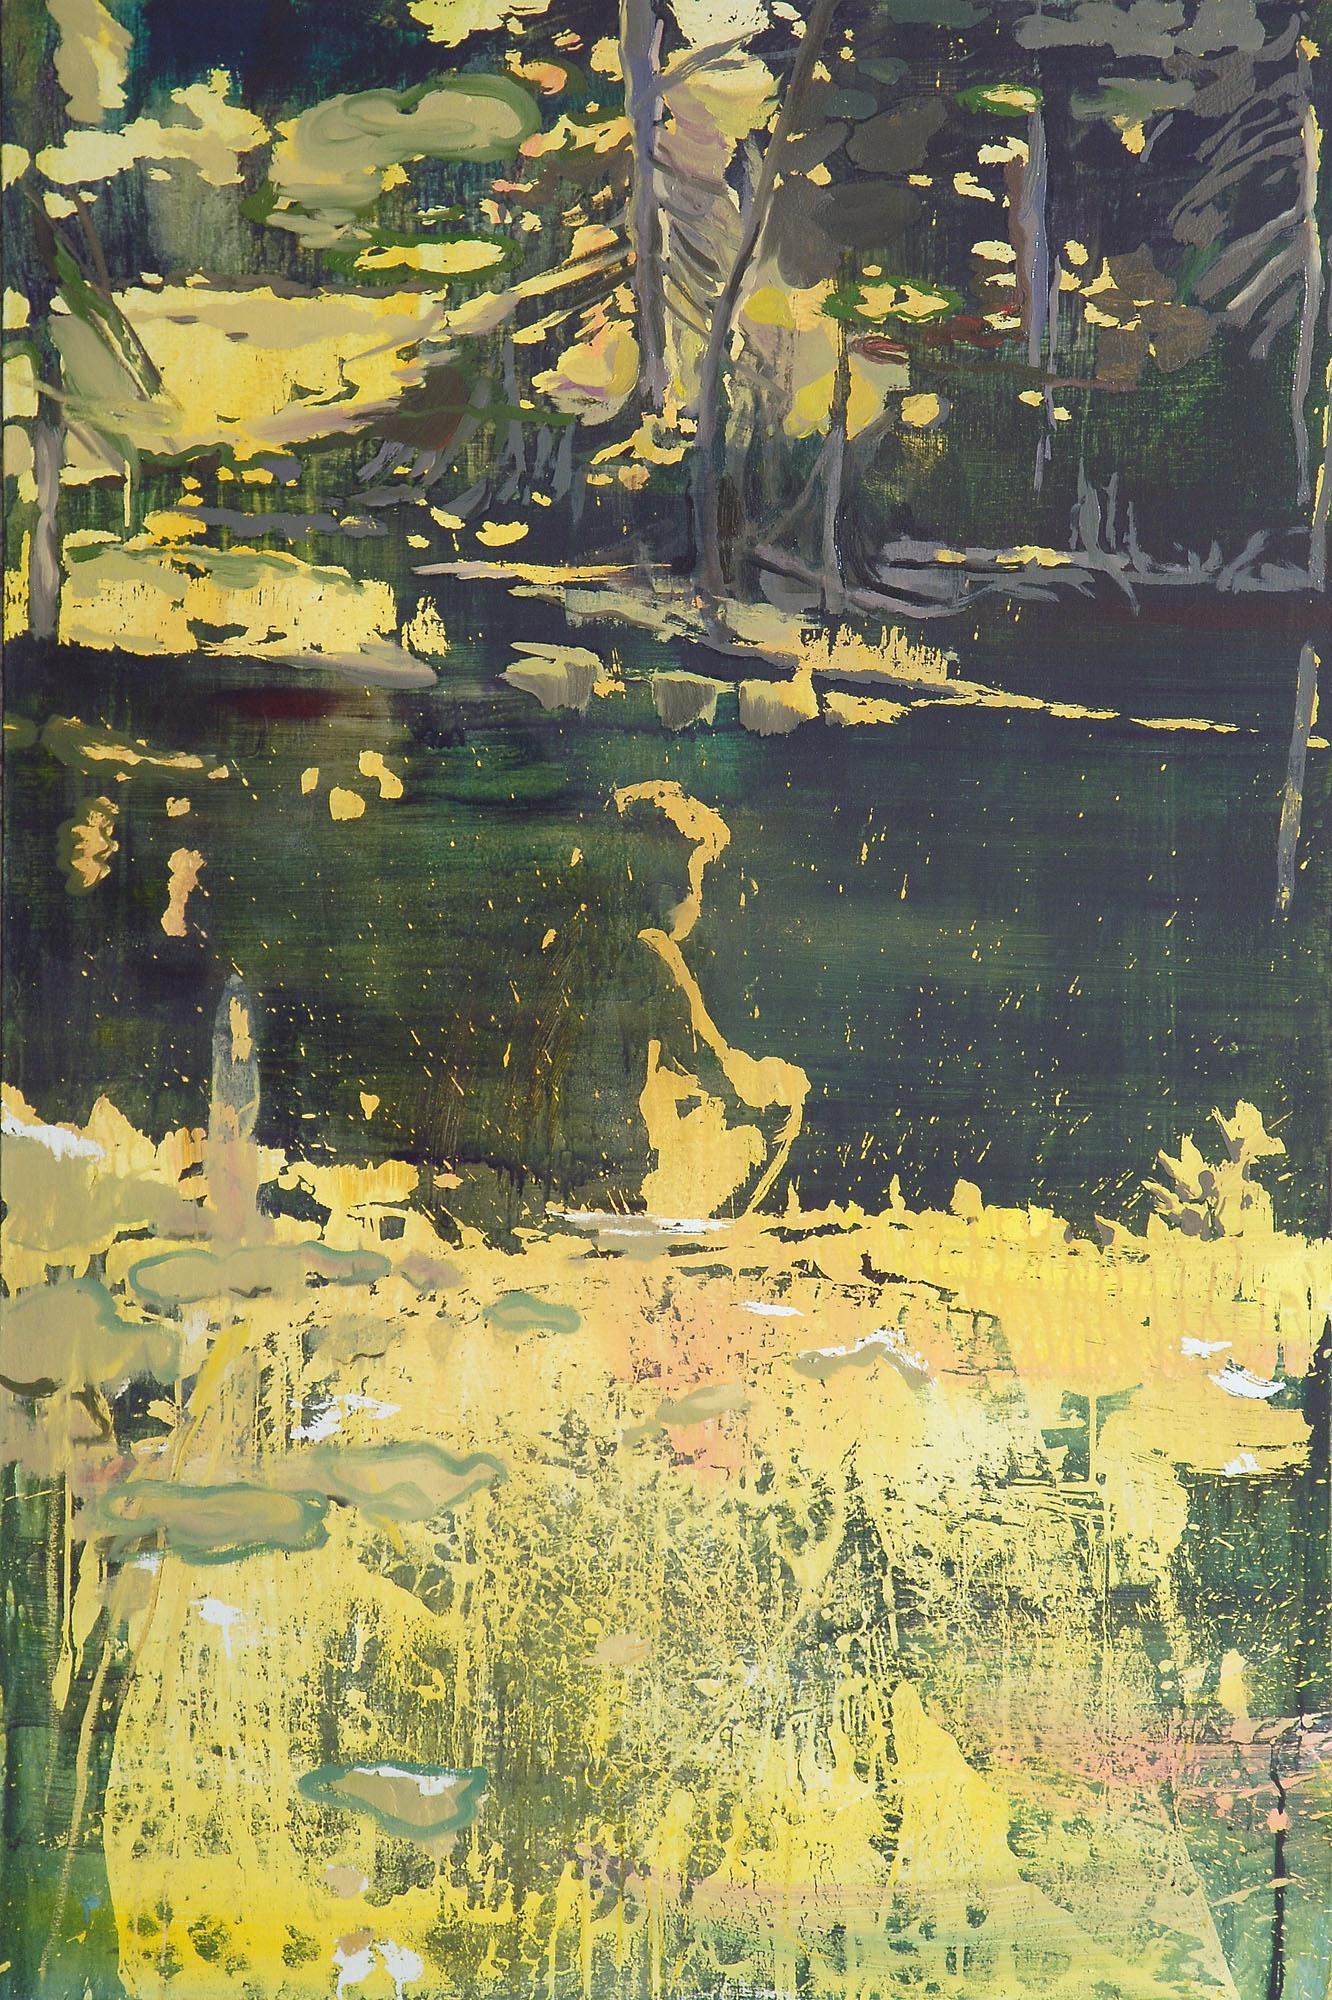 Lu Song 吕松, Hermit by the Pond 湖畔隐士, 2015, Oil on canvas 布面油画, 100 x 150 cm